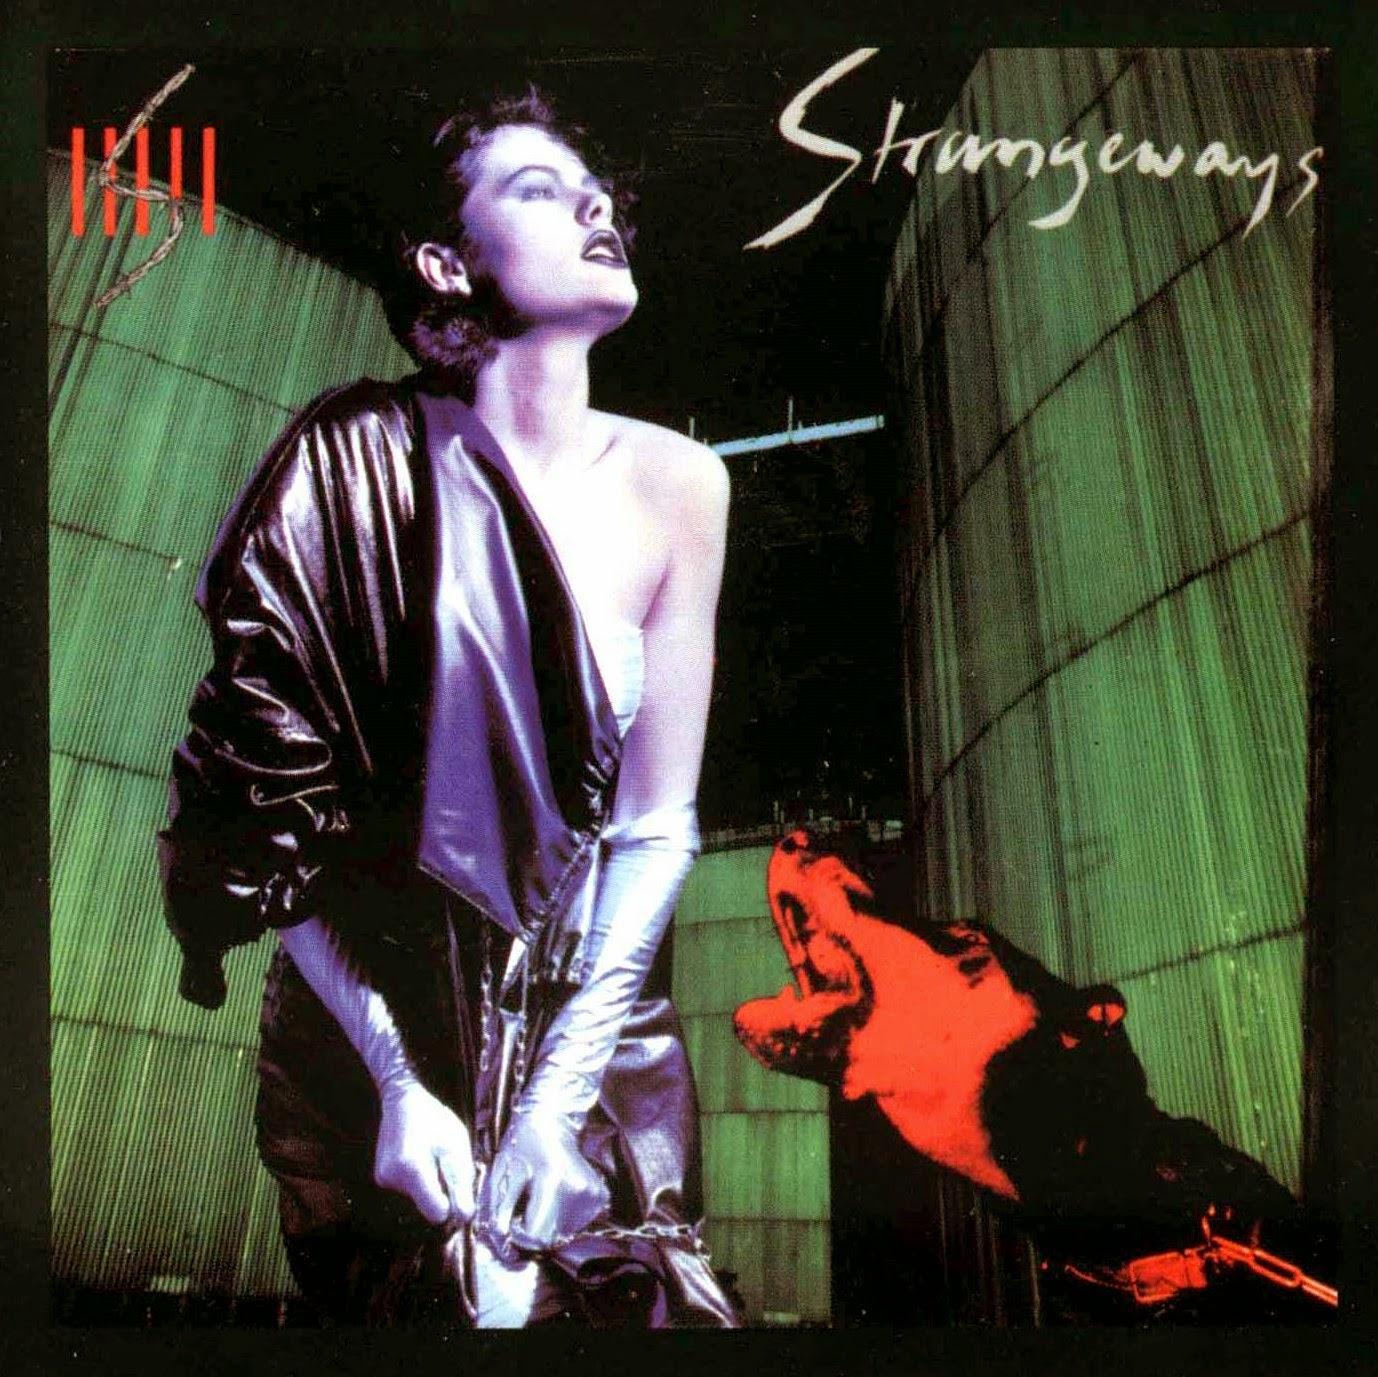 Strangeways st 1984 1985